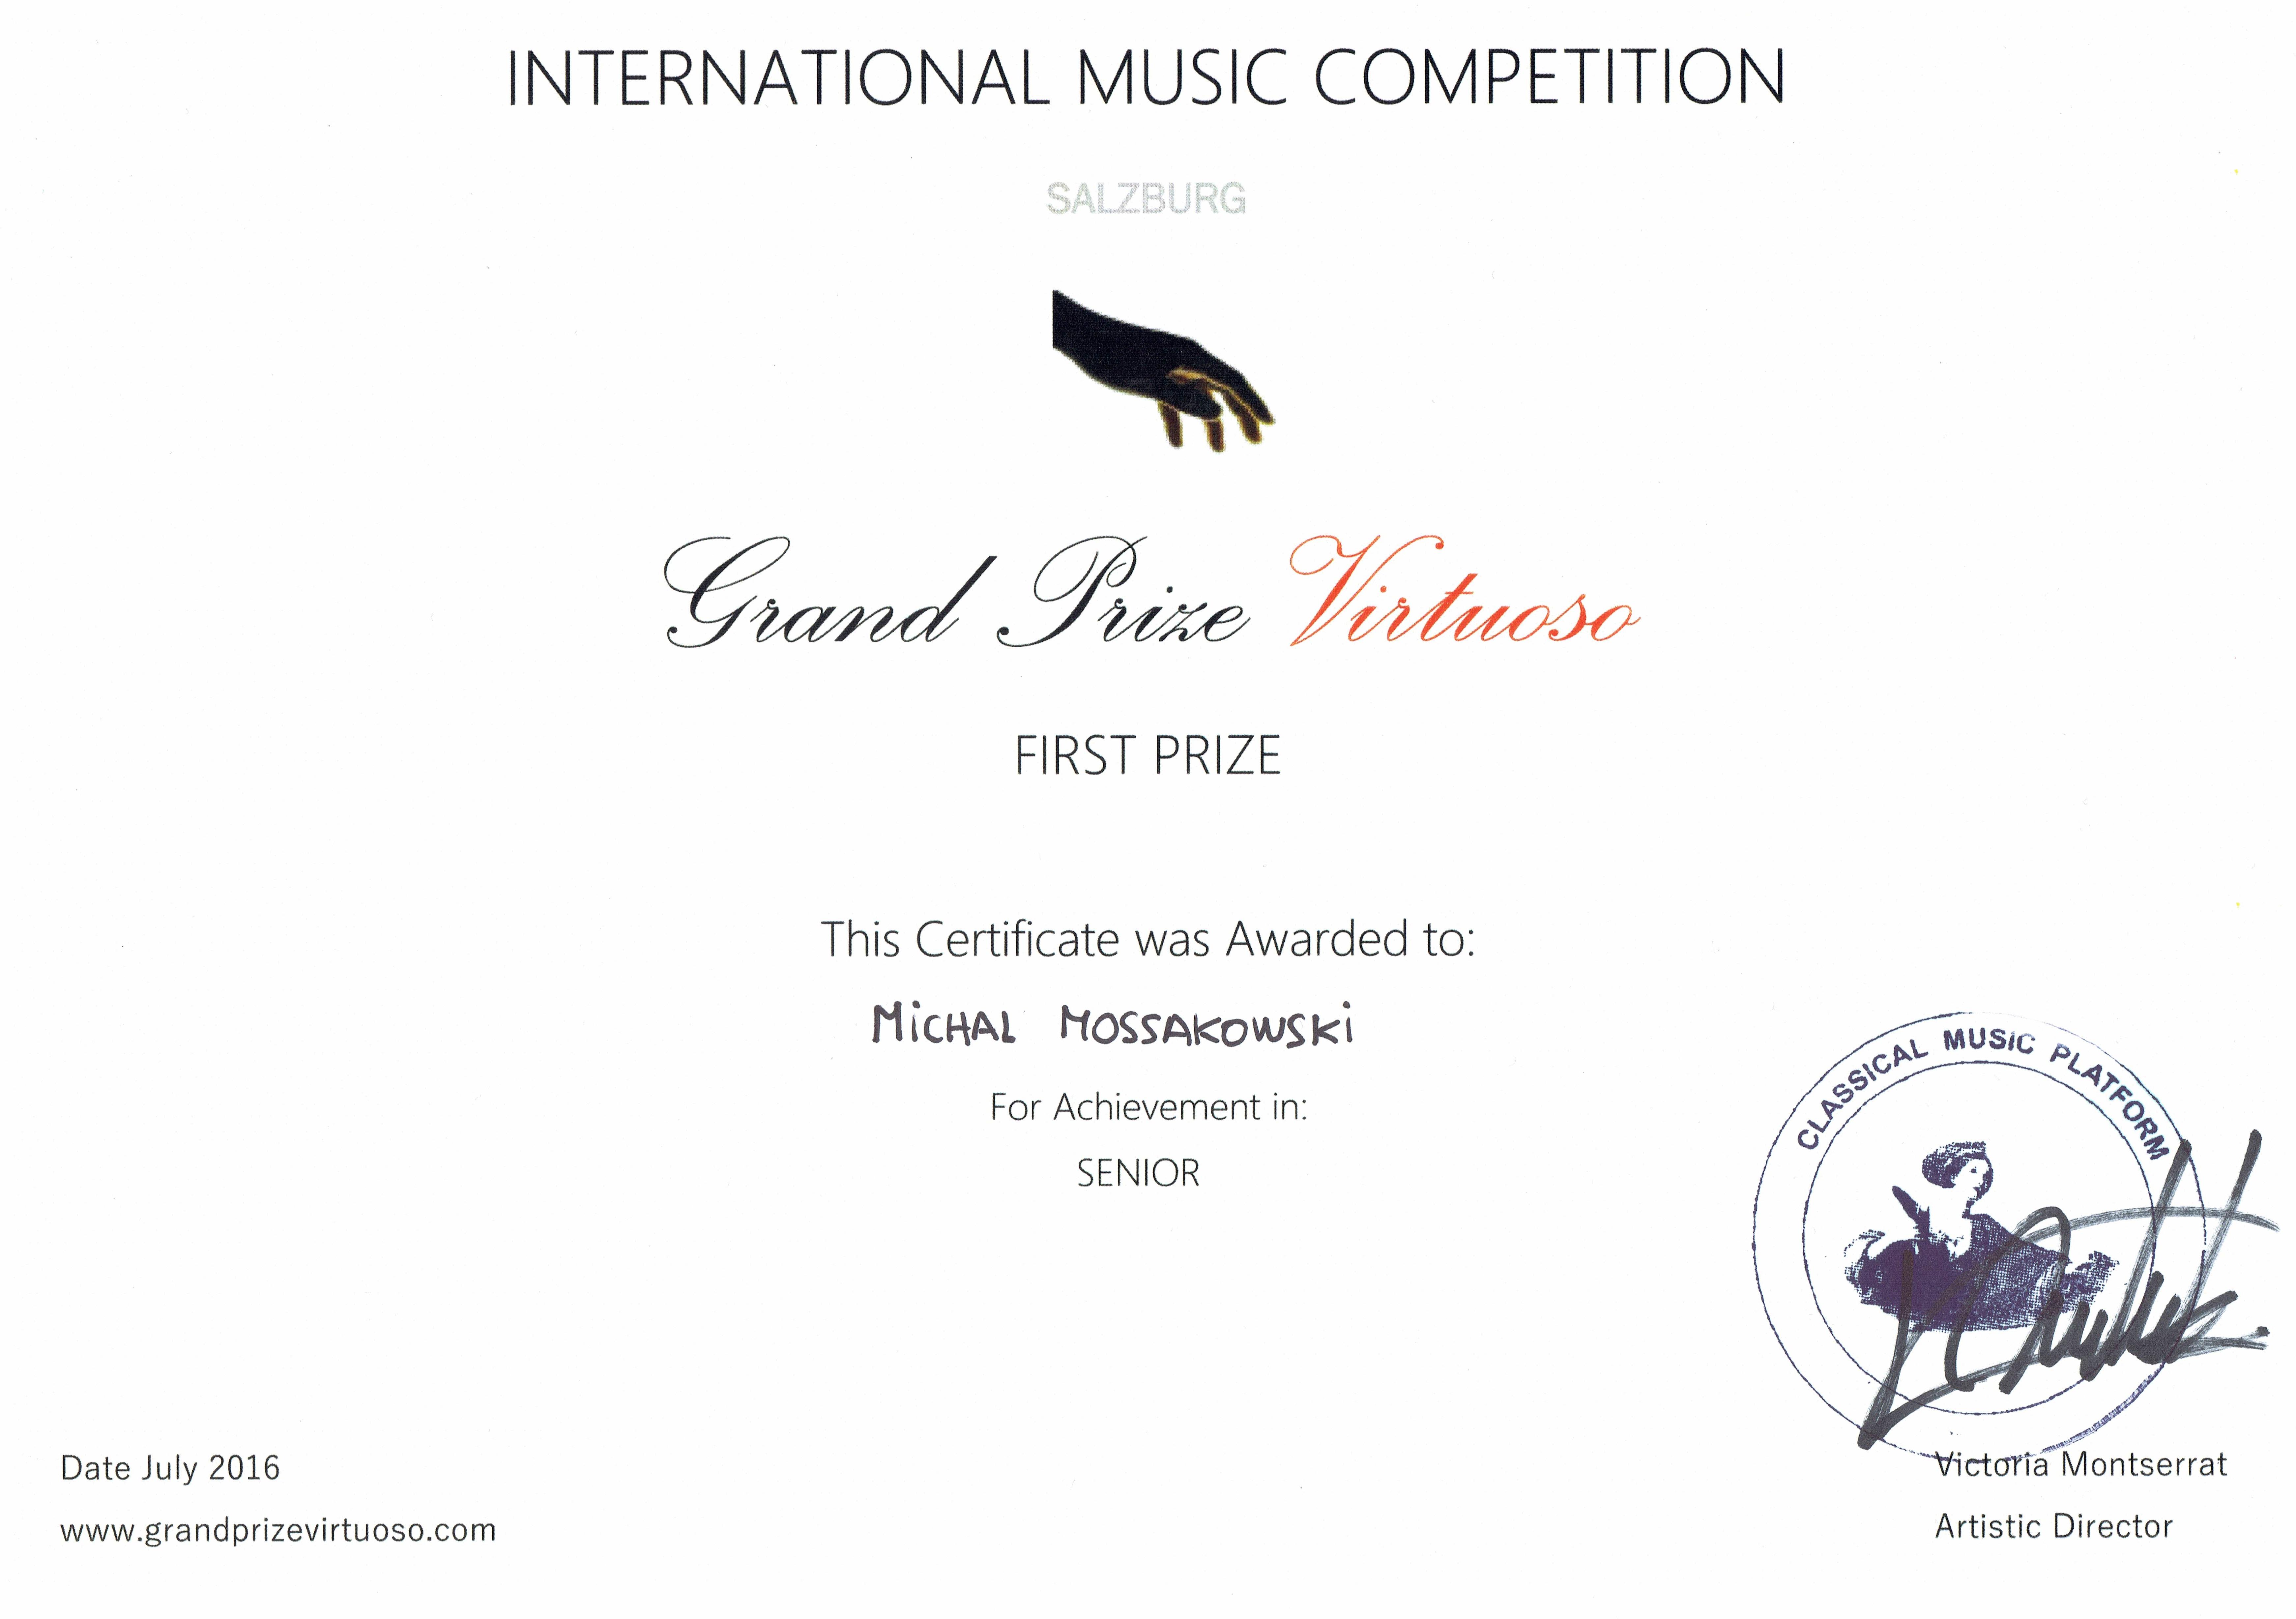 Mossakowski_Michal_Grand Prize Virtuoso_Salzburg_2016